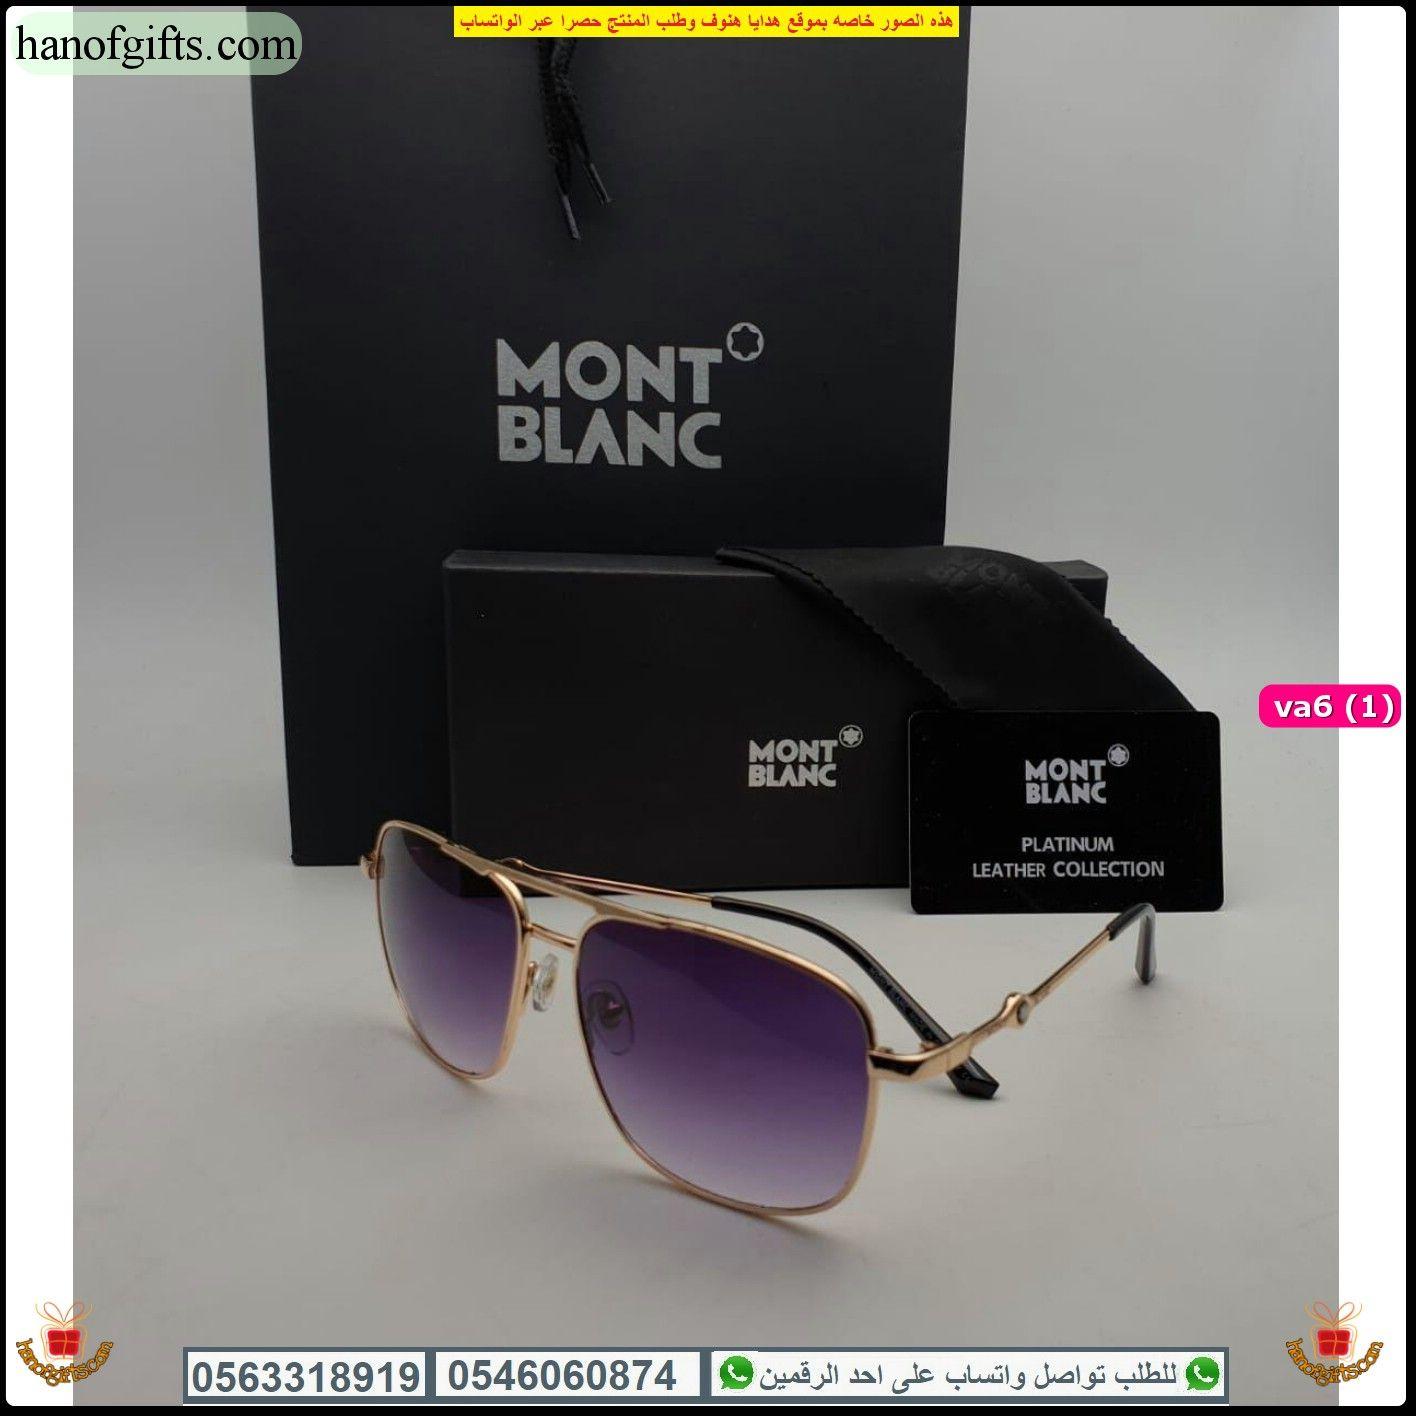 نظارات مونت بلانك رجاليه Mont Blanc مع جميع ملحقاتها و بنفس اسم الماركه هدايا هنوف Leather Square Sunglass Mont Blanc